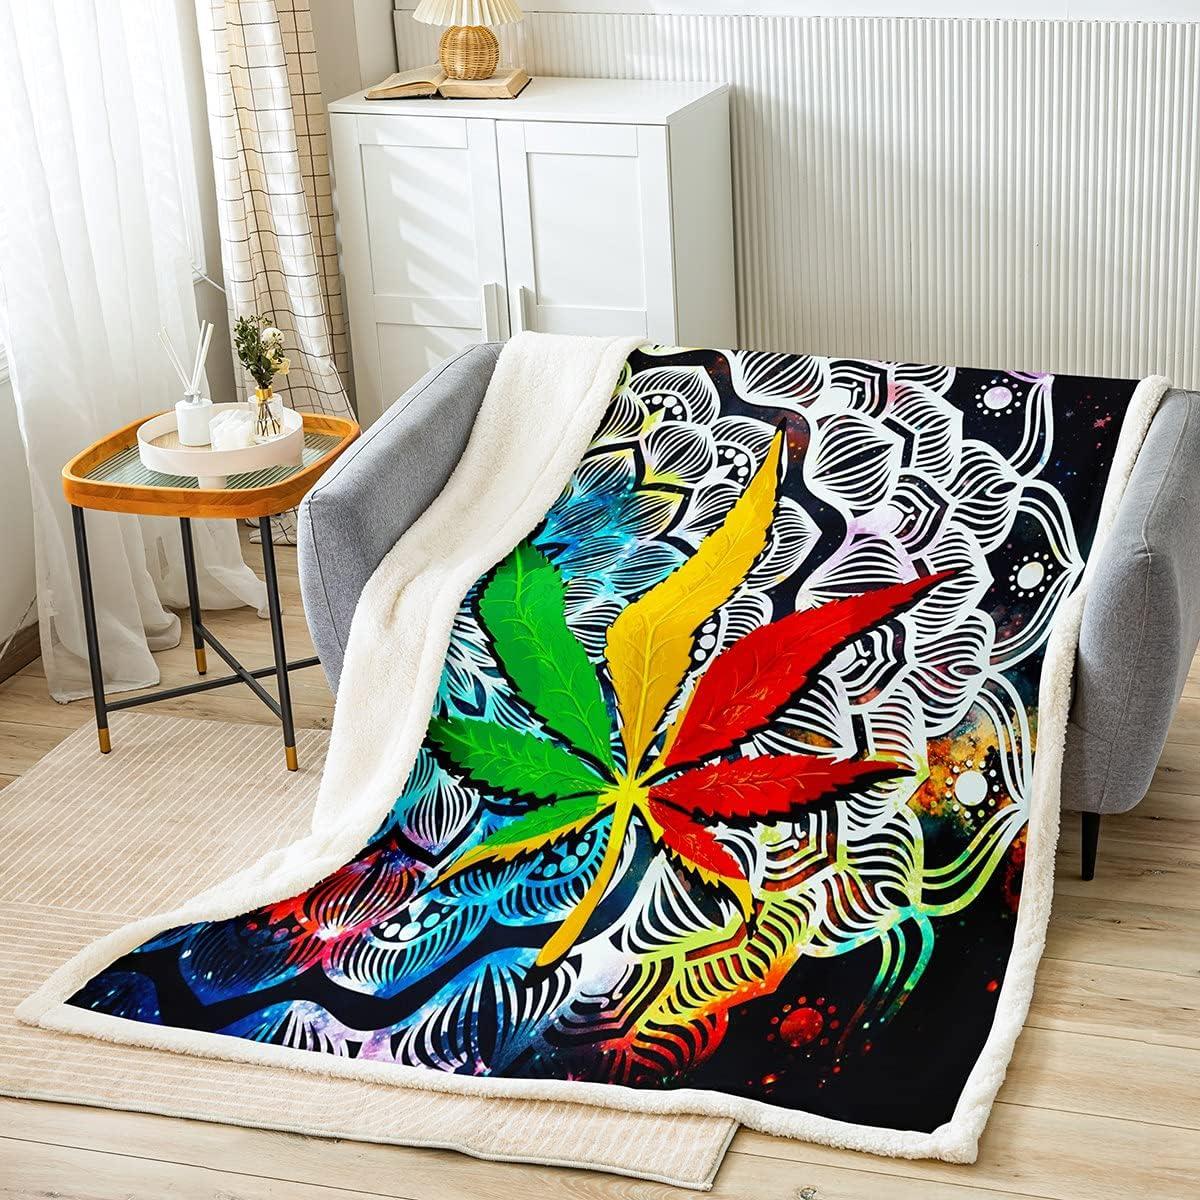 Castle Fairy Home Marijuana Weed Throw Ranking 70% OFF Outlet TOP13 Blanket Blan Mandala Boho